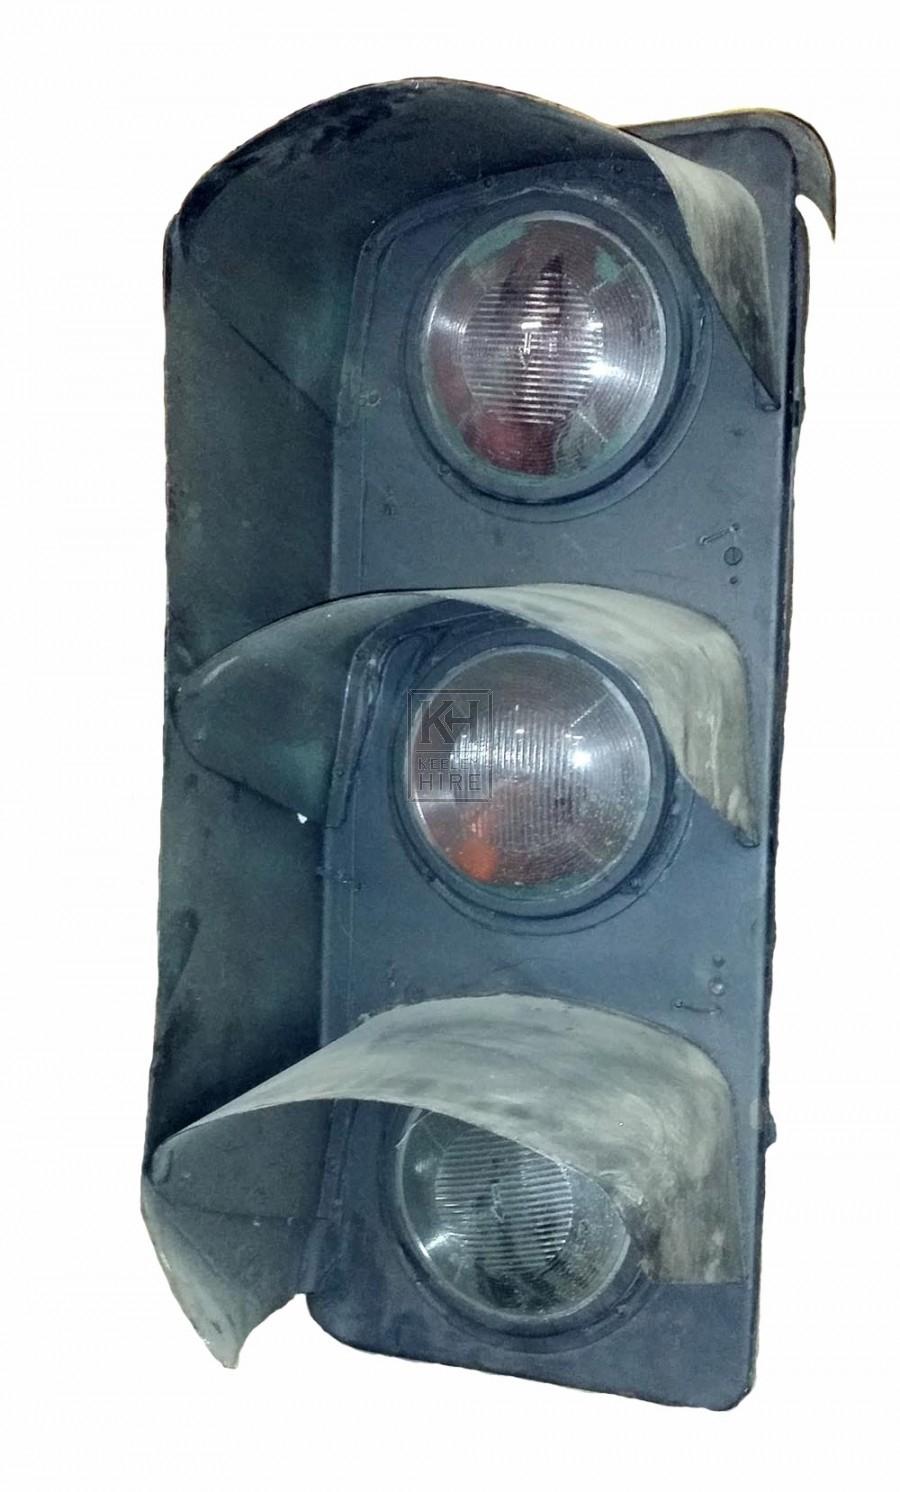 Large traffic lights